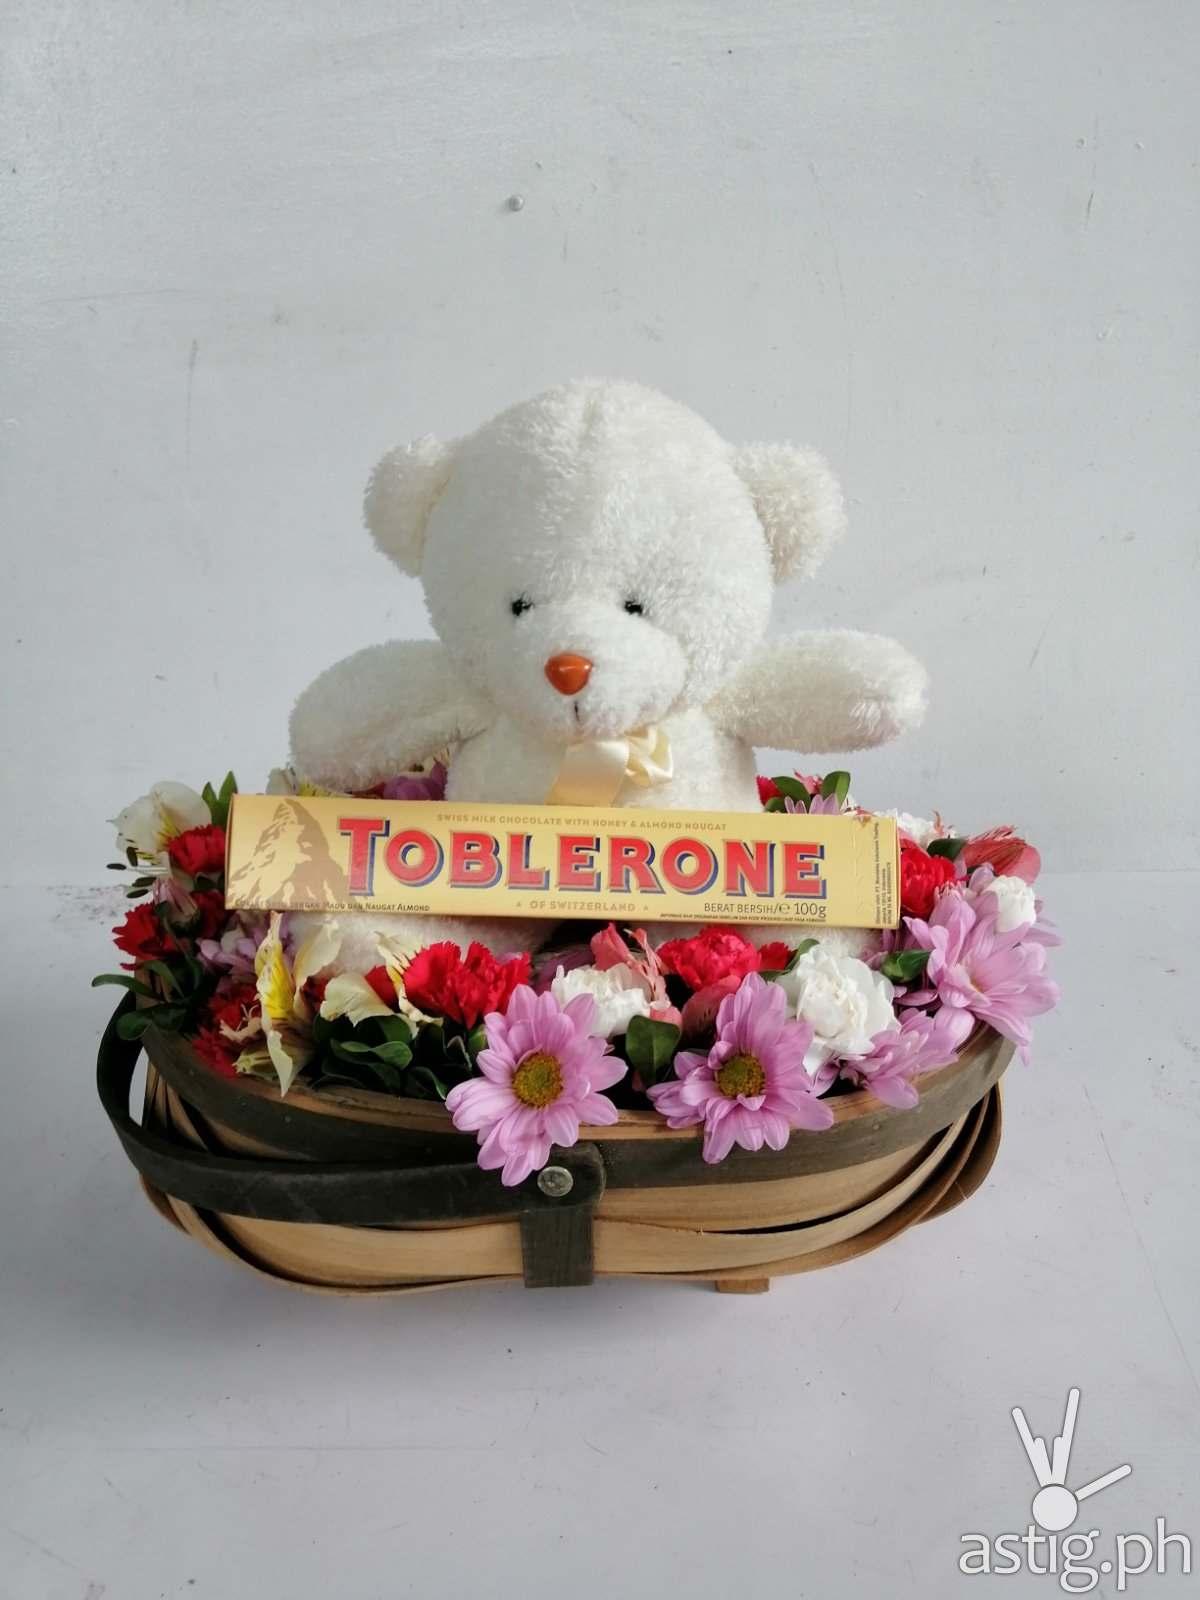 Toblerone Teddy Basket